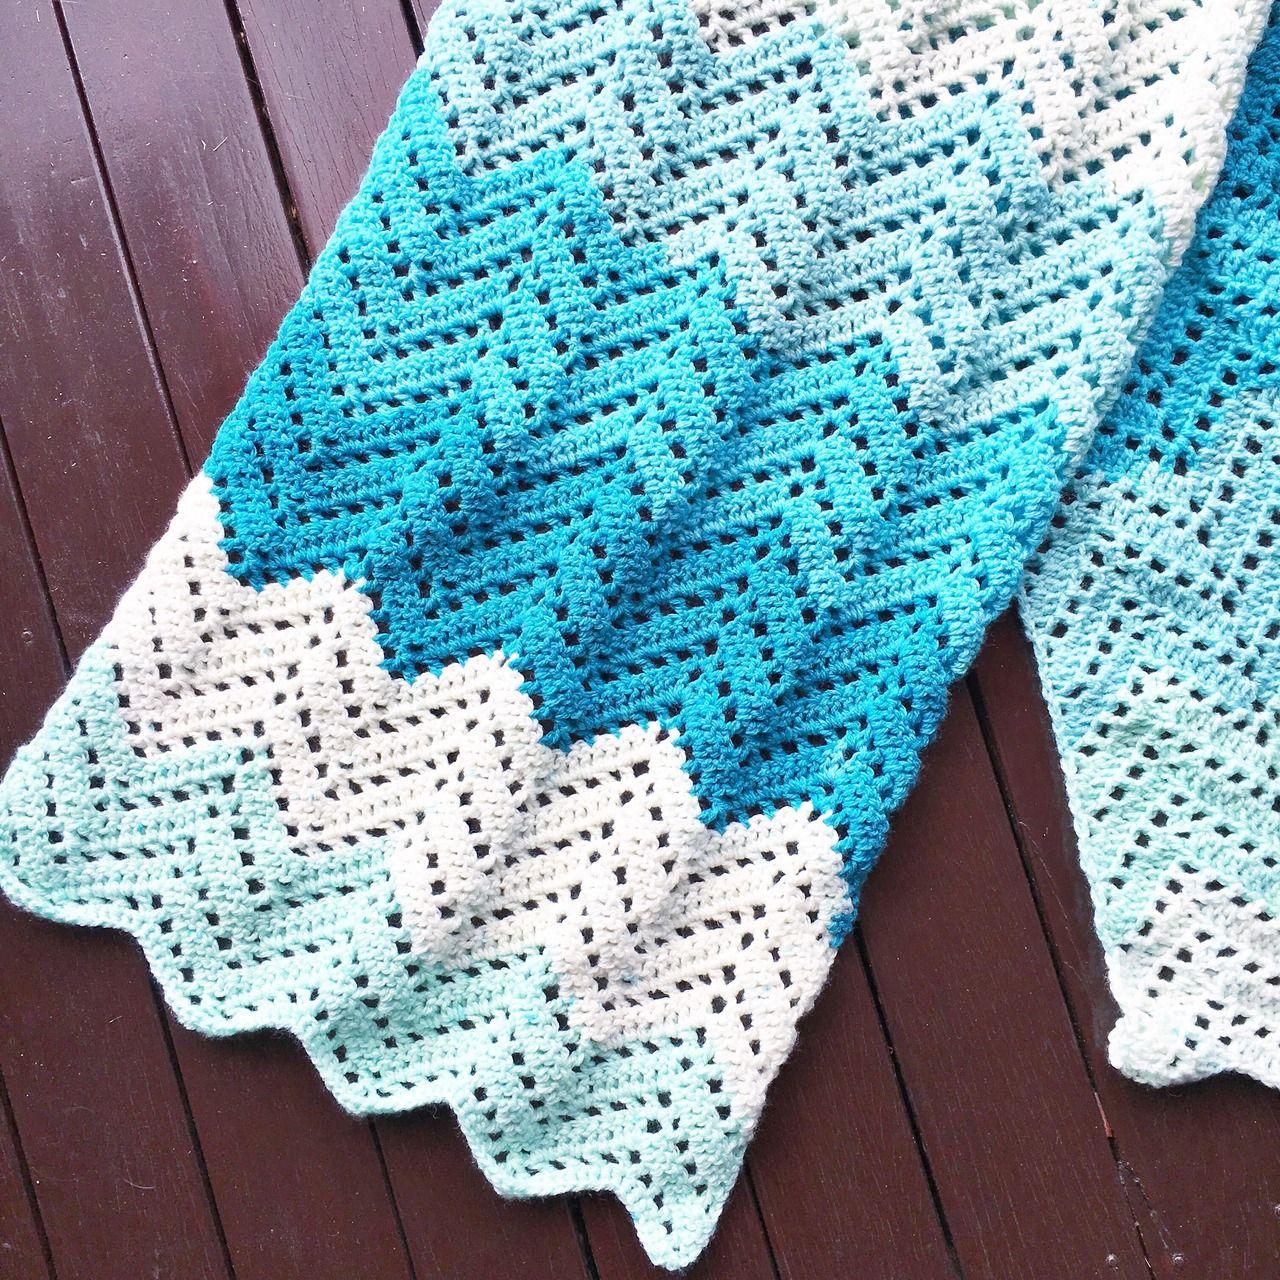 russian lace crochet scarf diagram to kill a mockingbird plot lacy chevron wrap free pattern yarns and weather